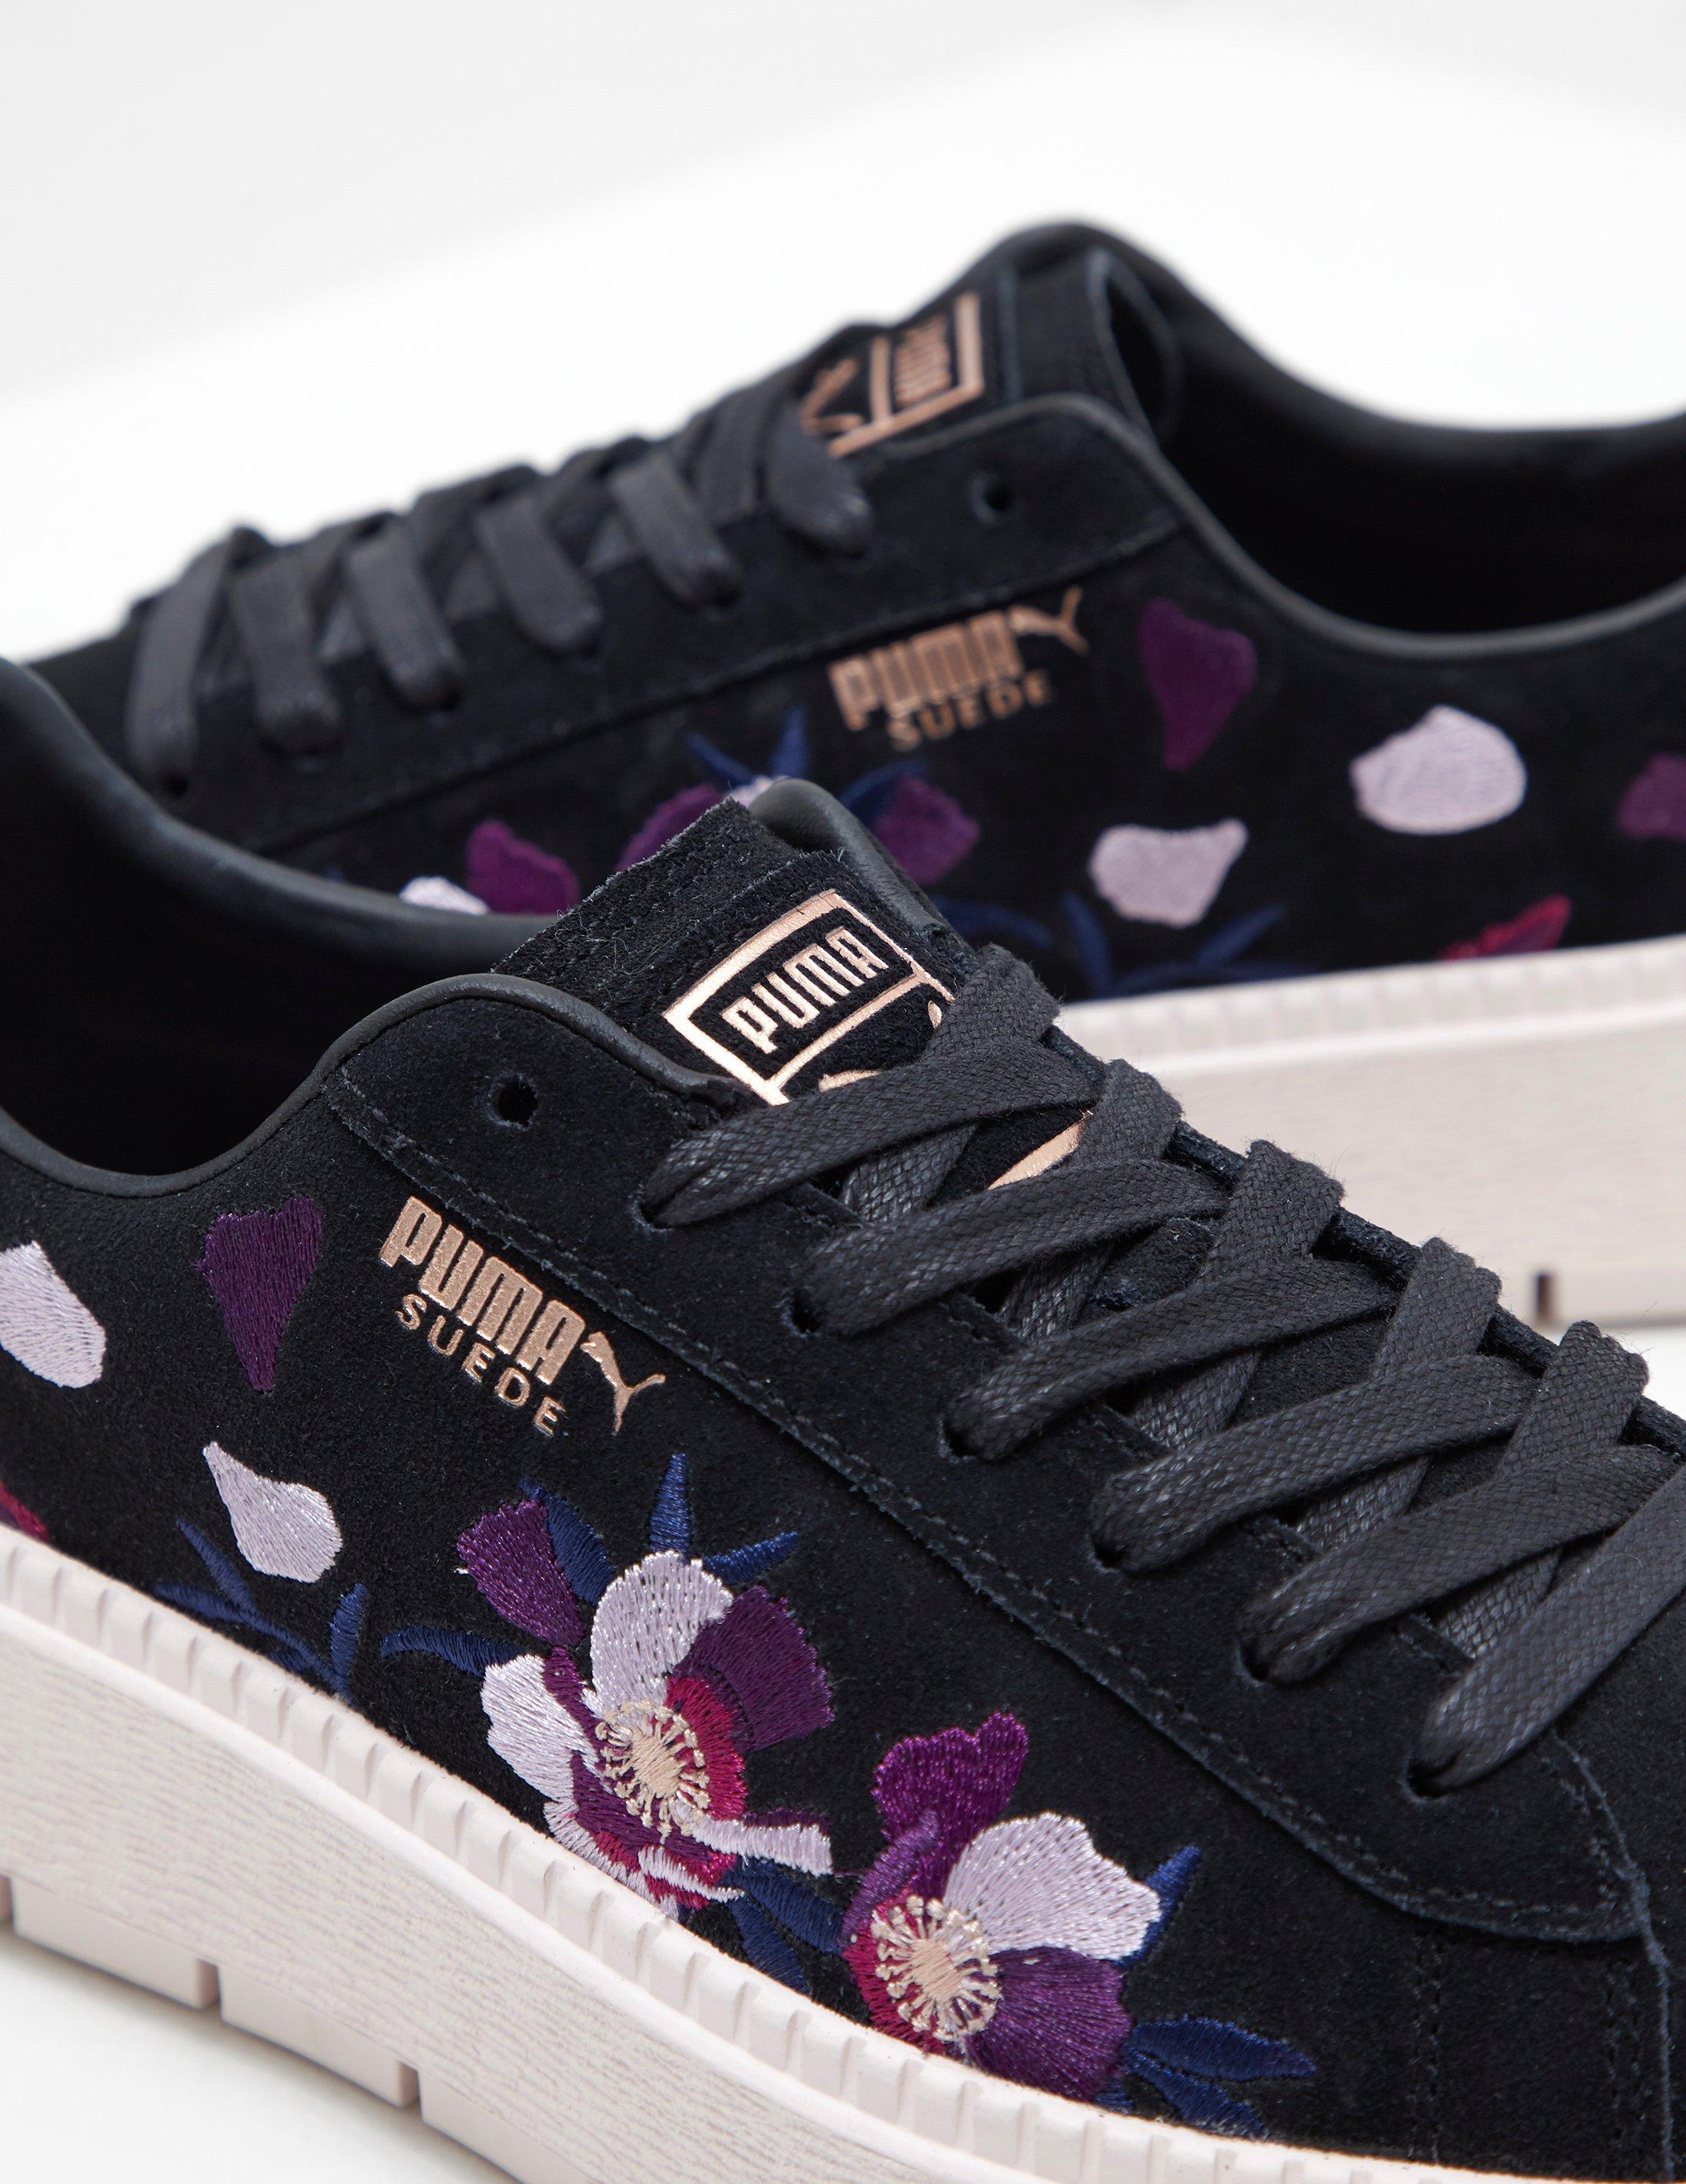 puma platform flower - 55% OFF